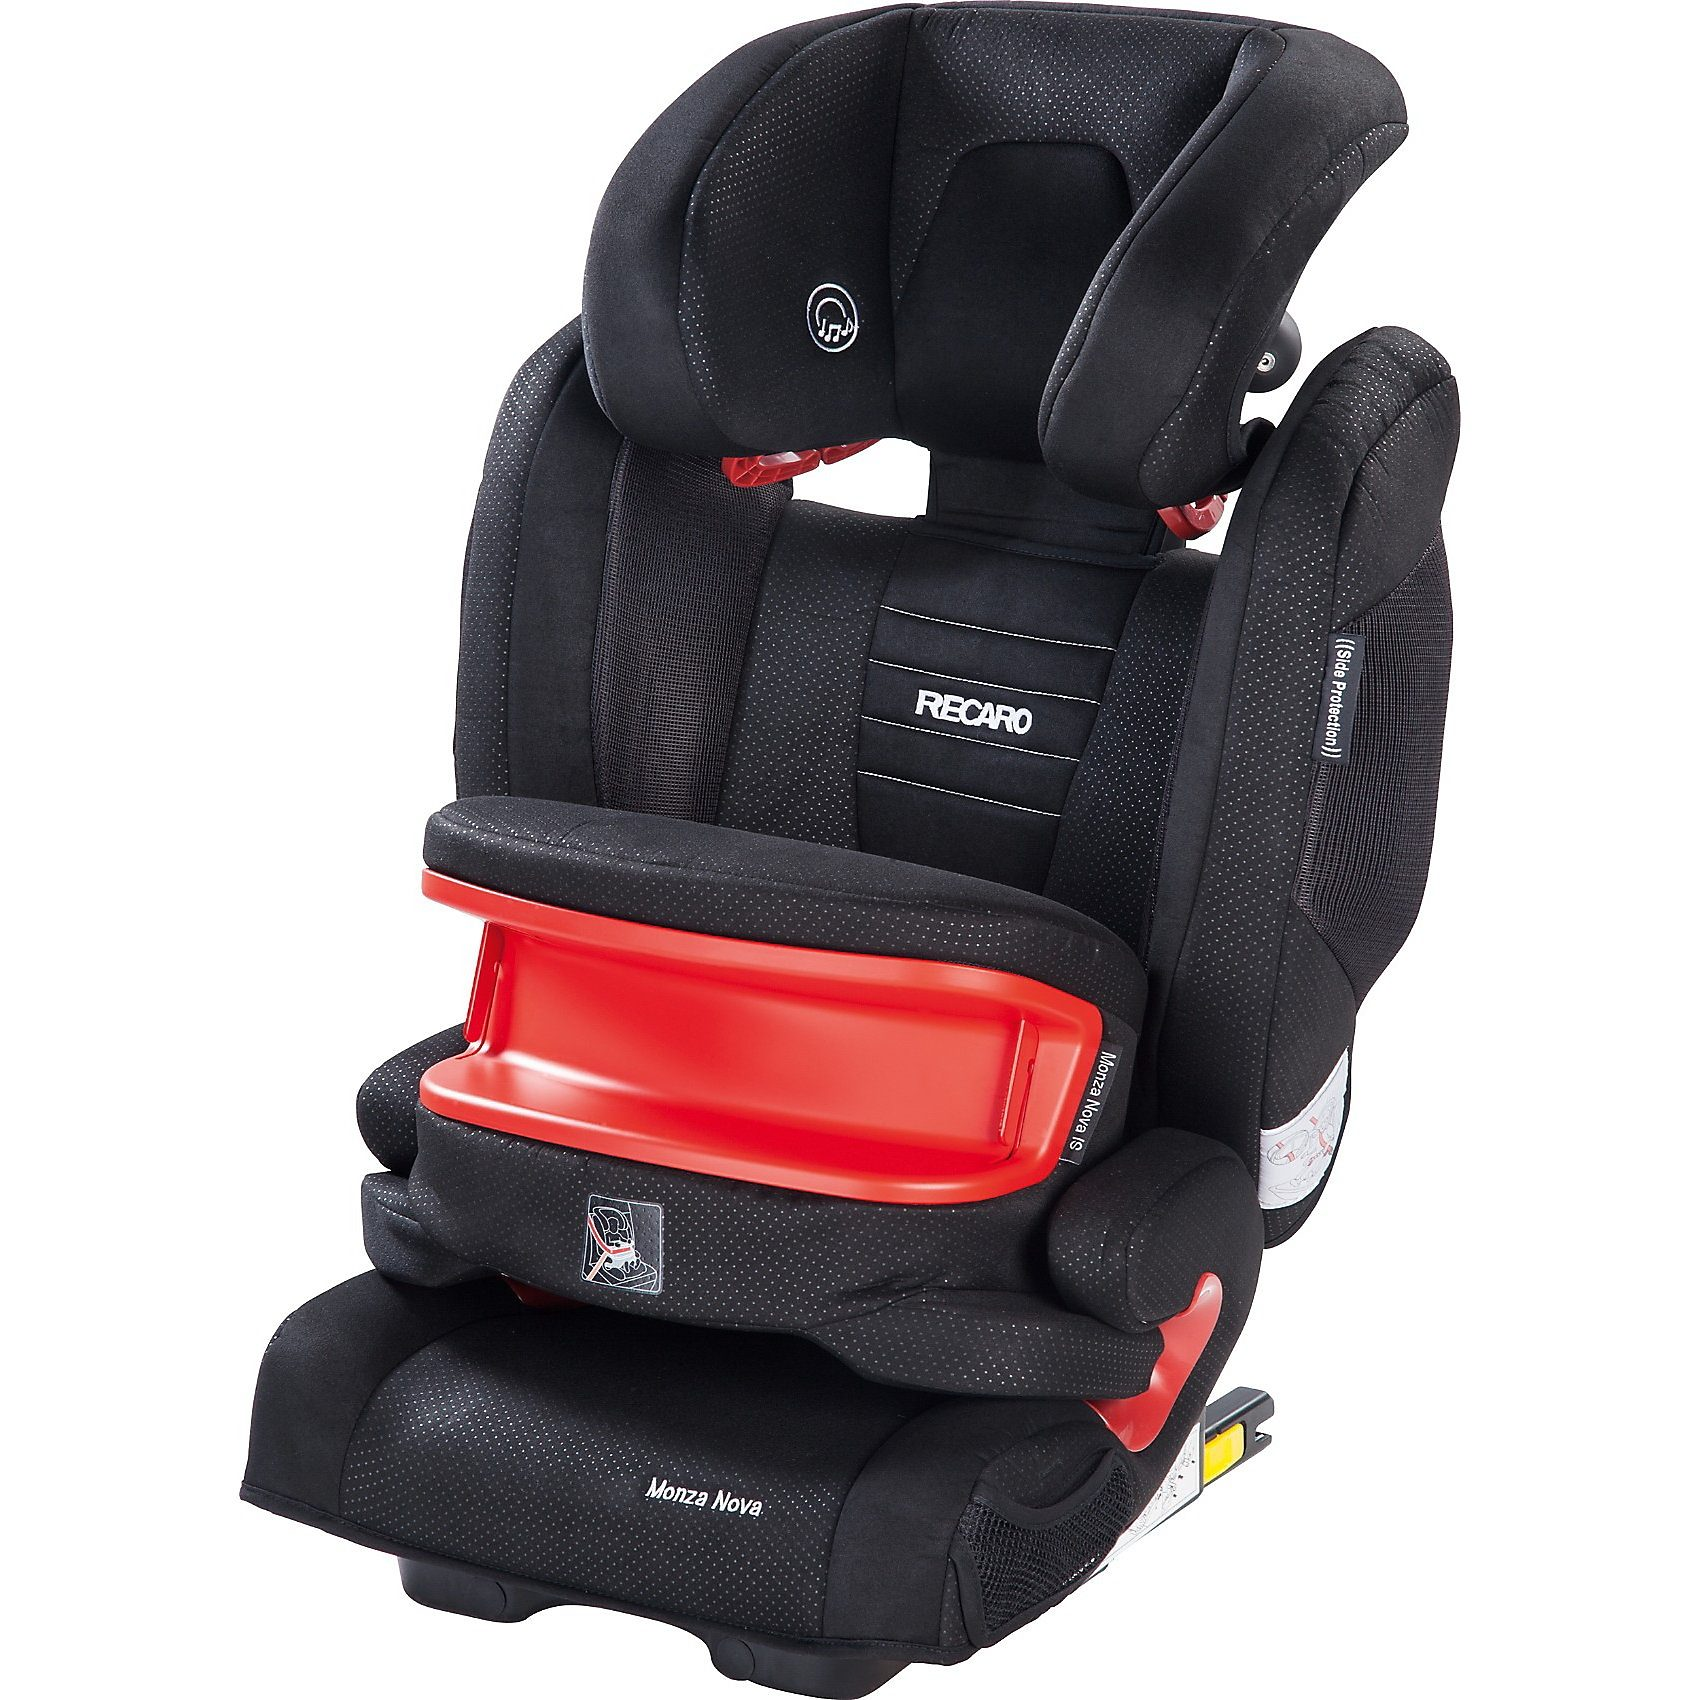 RECARO Auto-Kindersitz Monza Nova IS Seatfix, Black